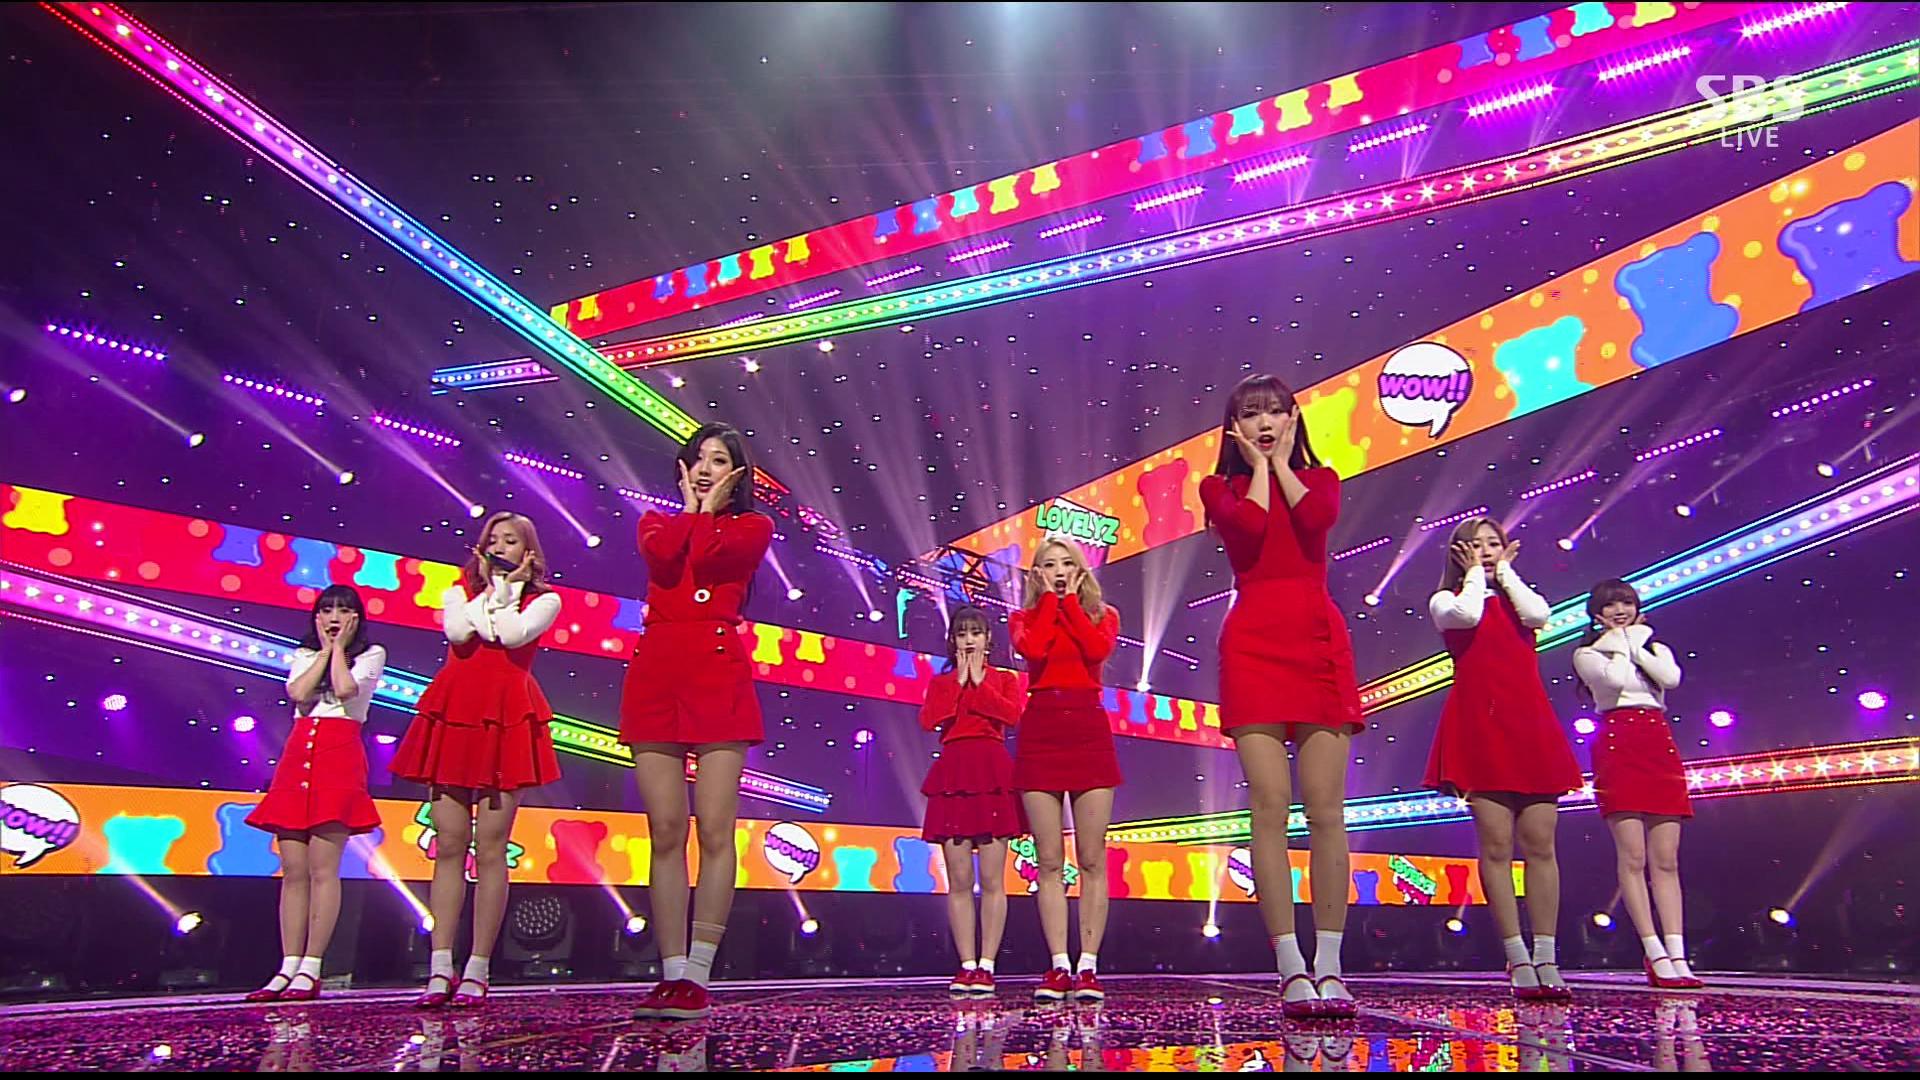 20170402.2035.4 Lovelyz - WoW (Inkigayo 2017.04.02) (JPOP.ru).jpg